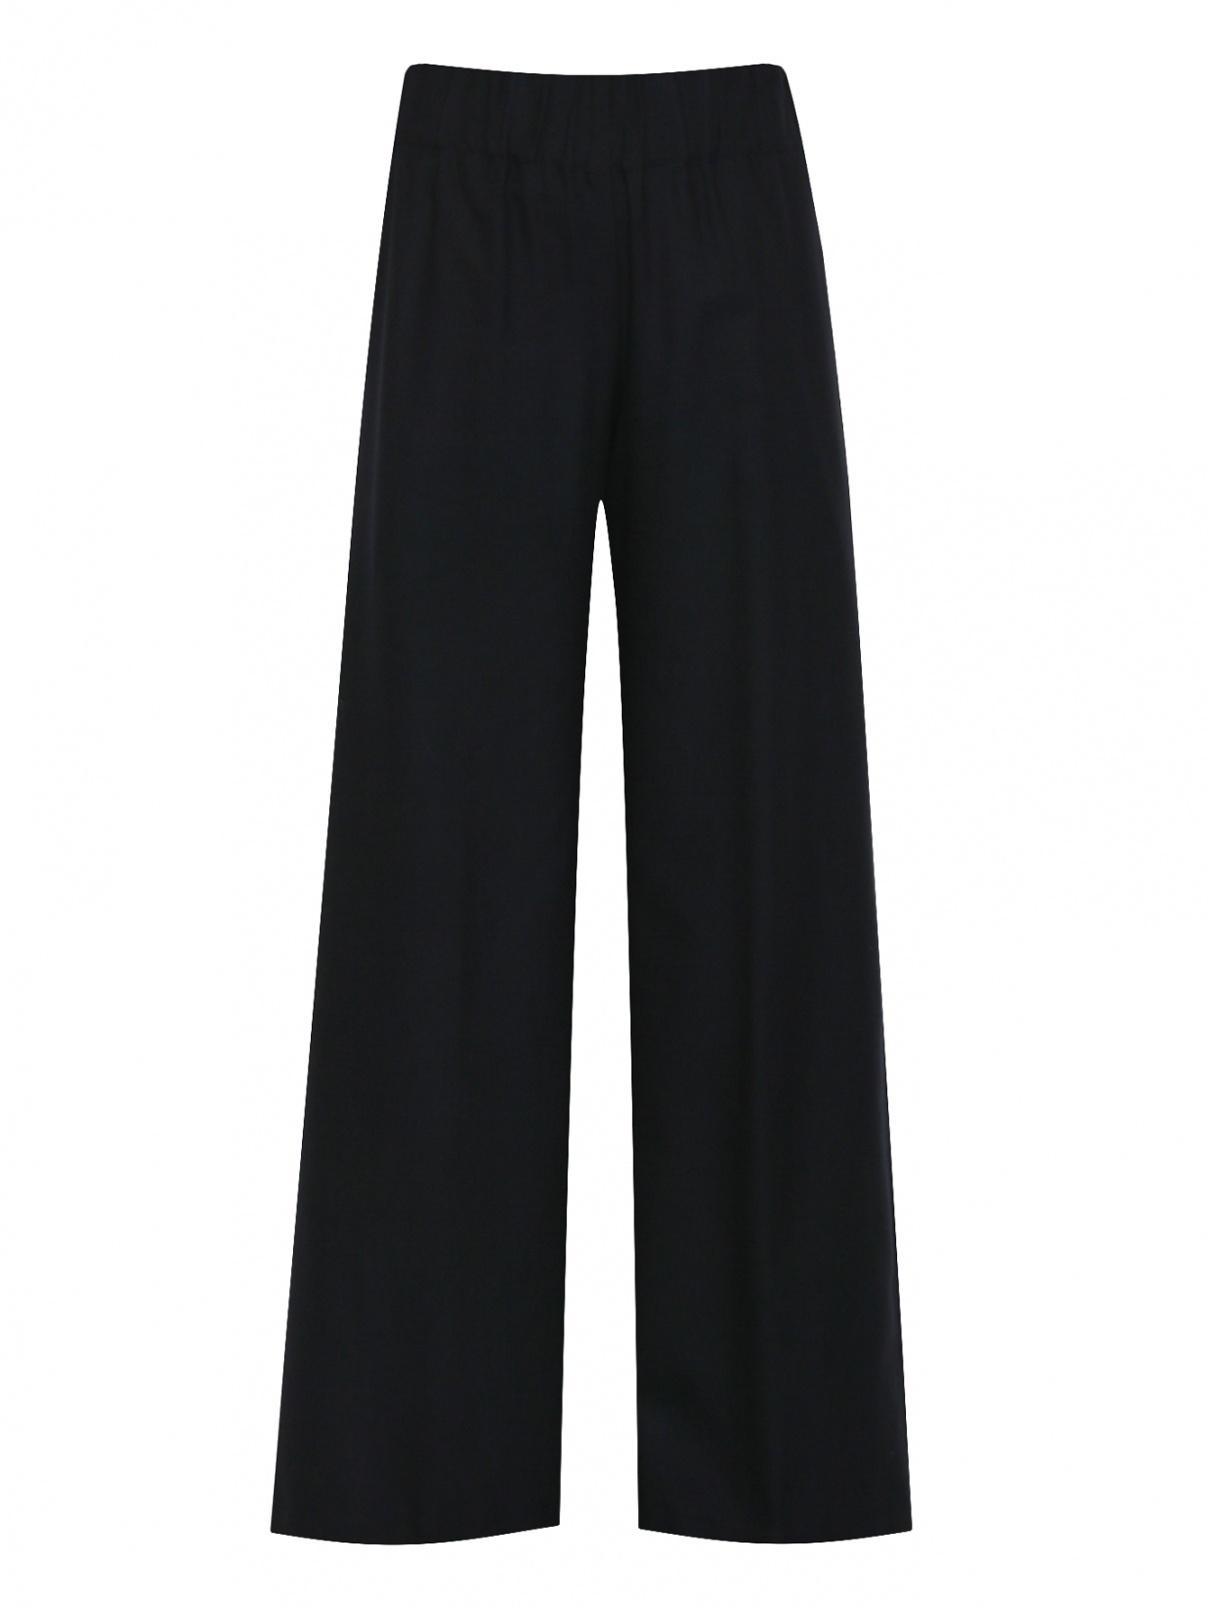 Широкие брюки из шерсти на резинке Aspesi  –  Общий вид